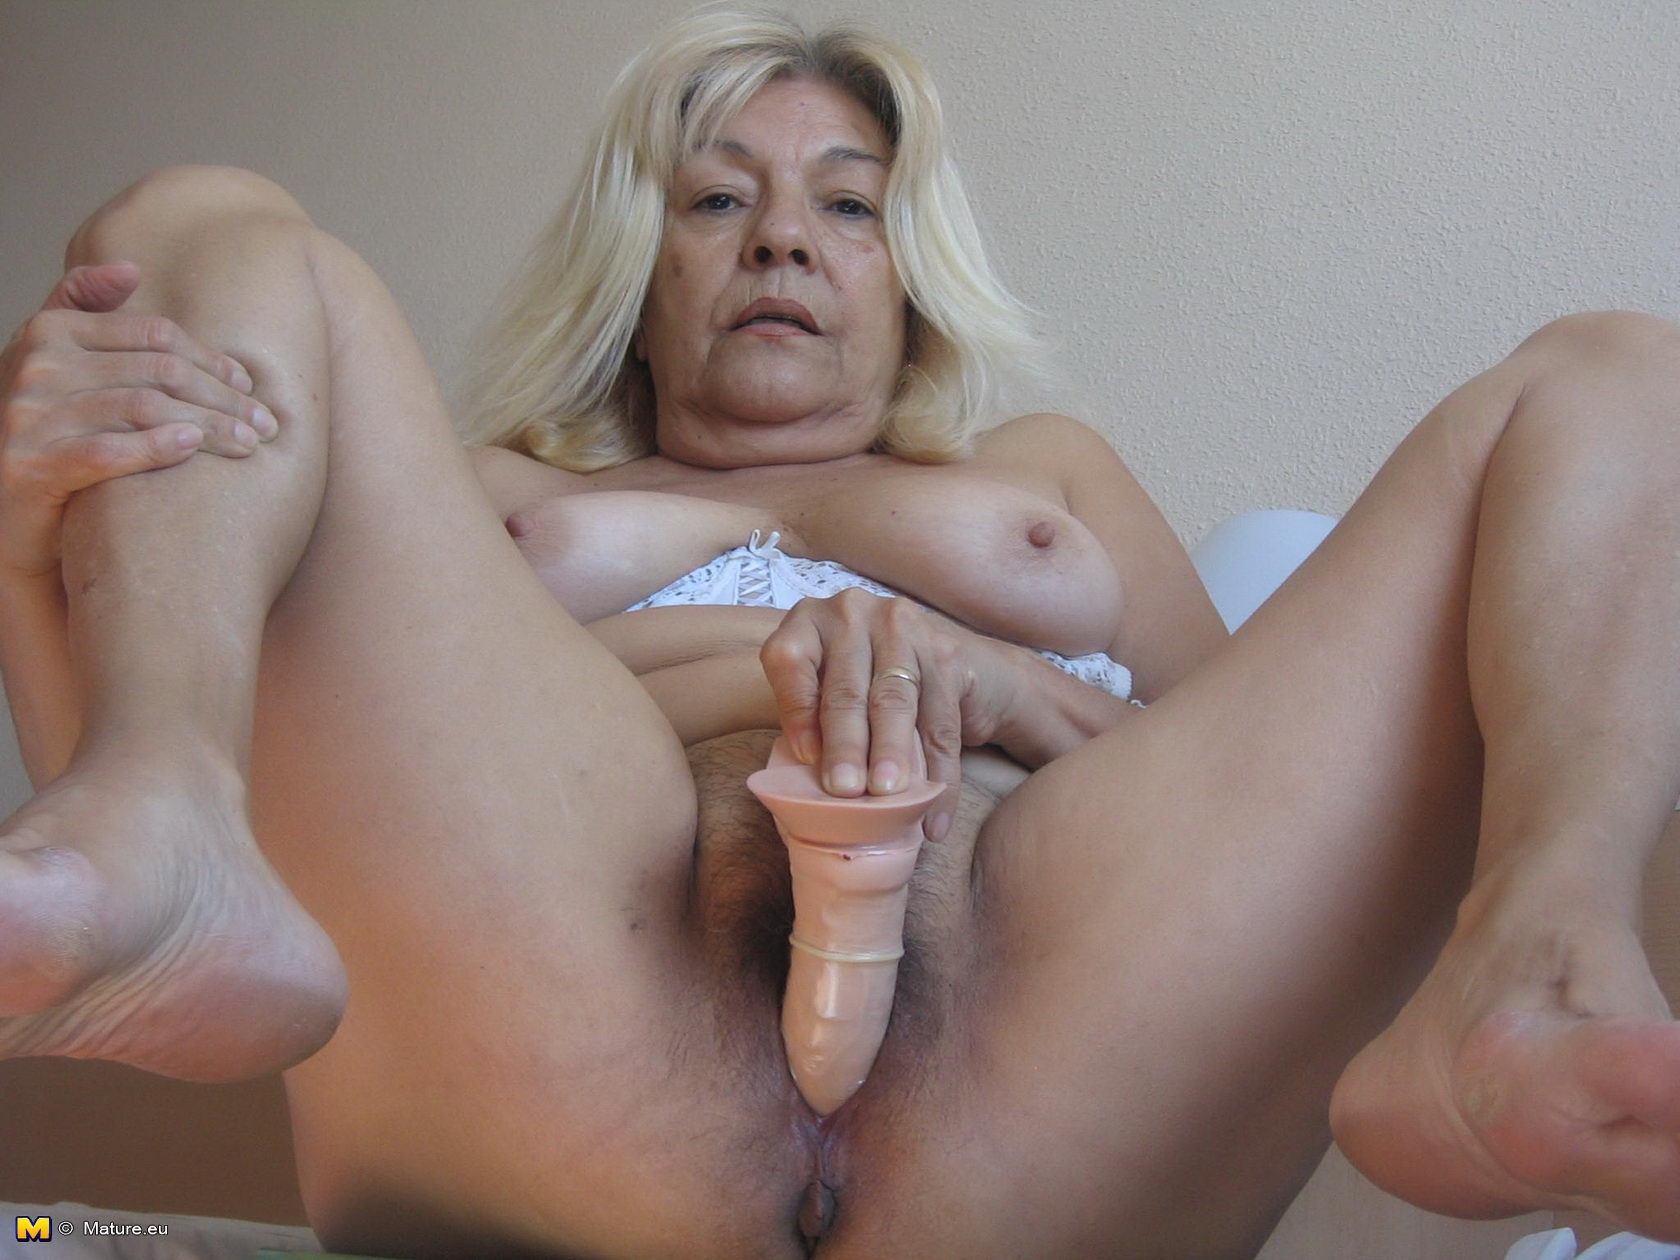 nude mature eu pics free